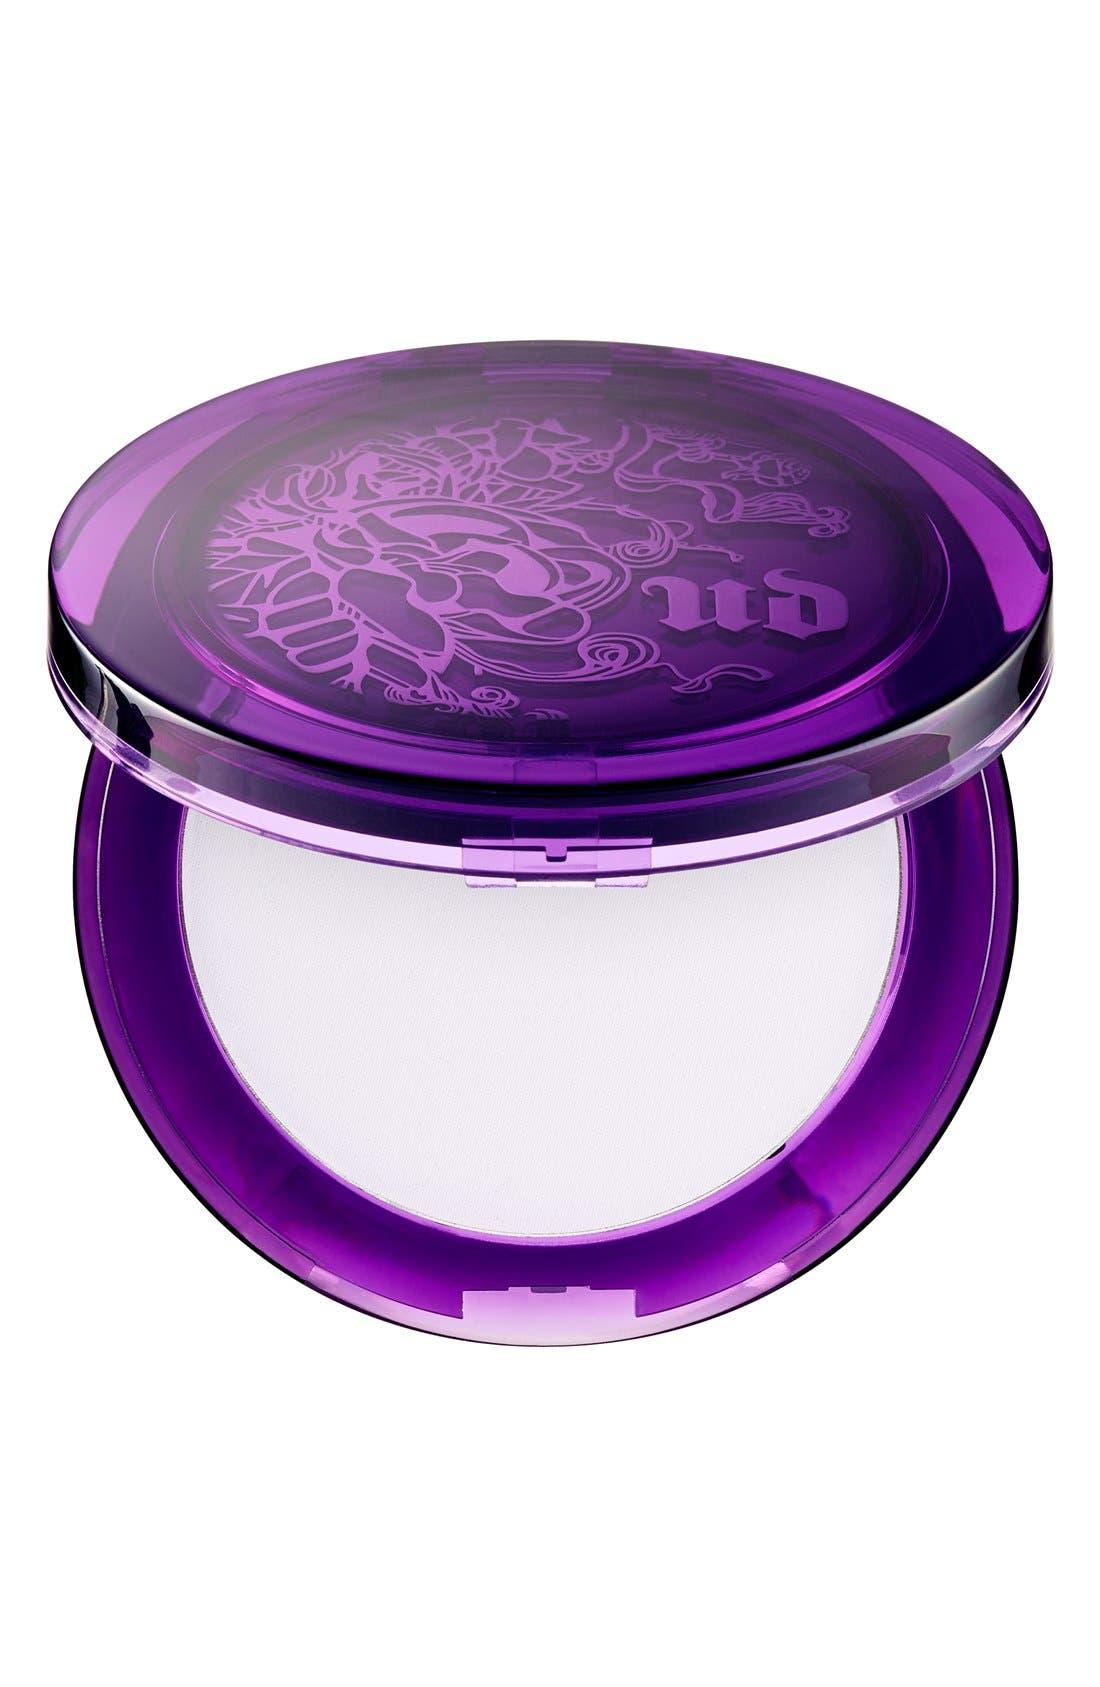 De-Slick Mattifying Powder,                         Main,                         color, NO COLOR